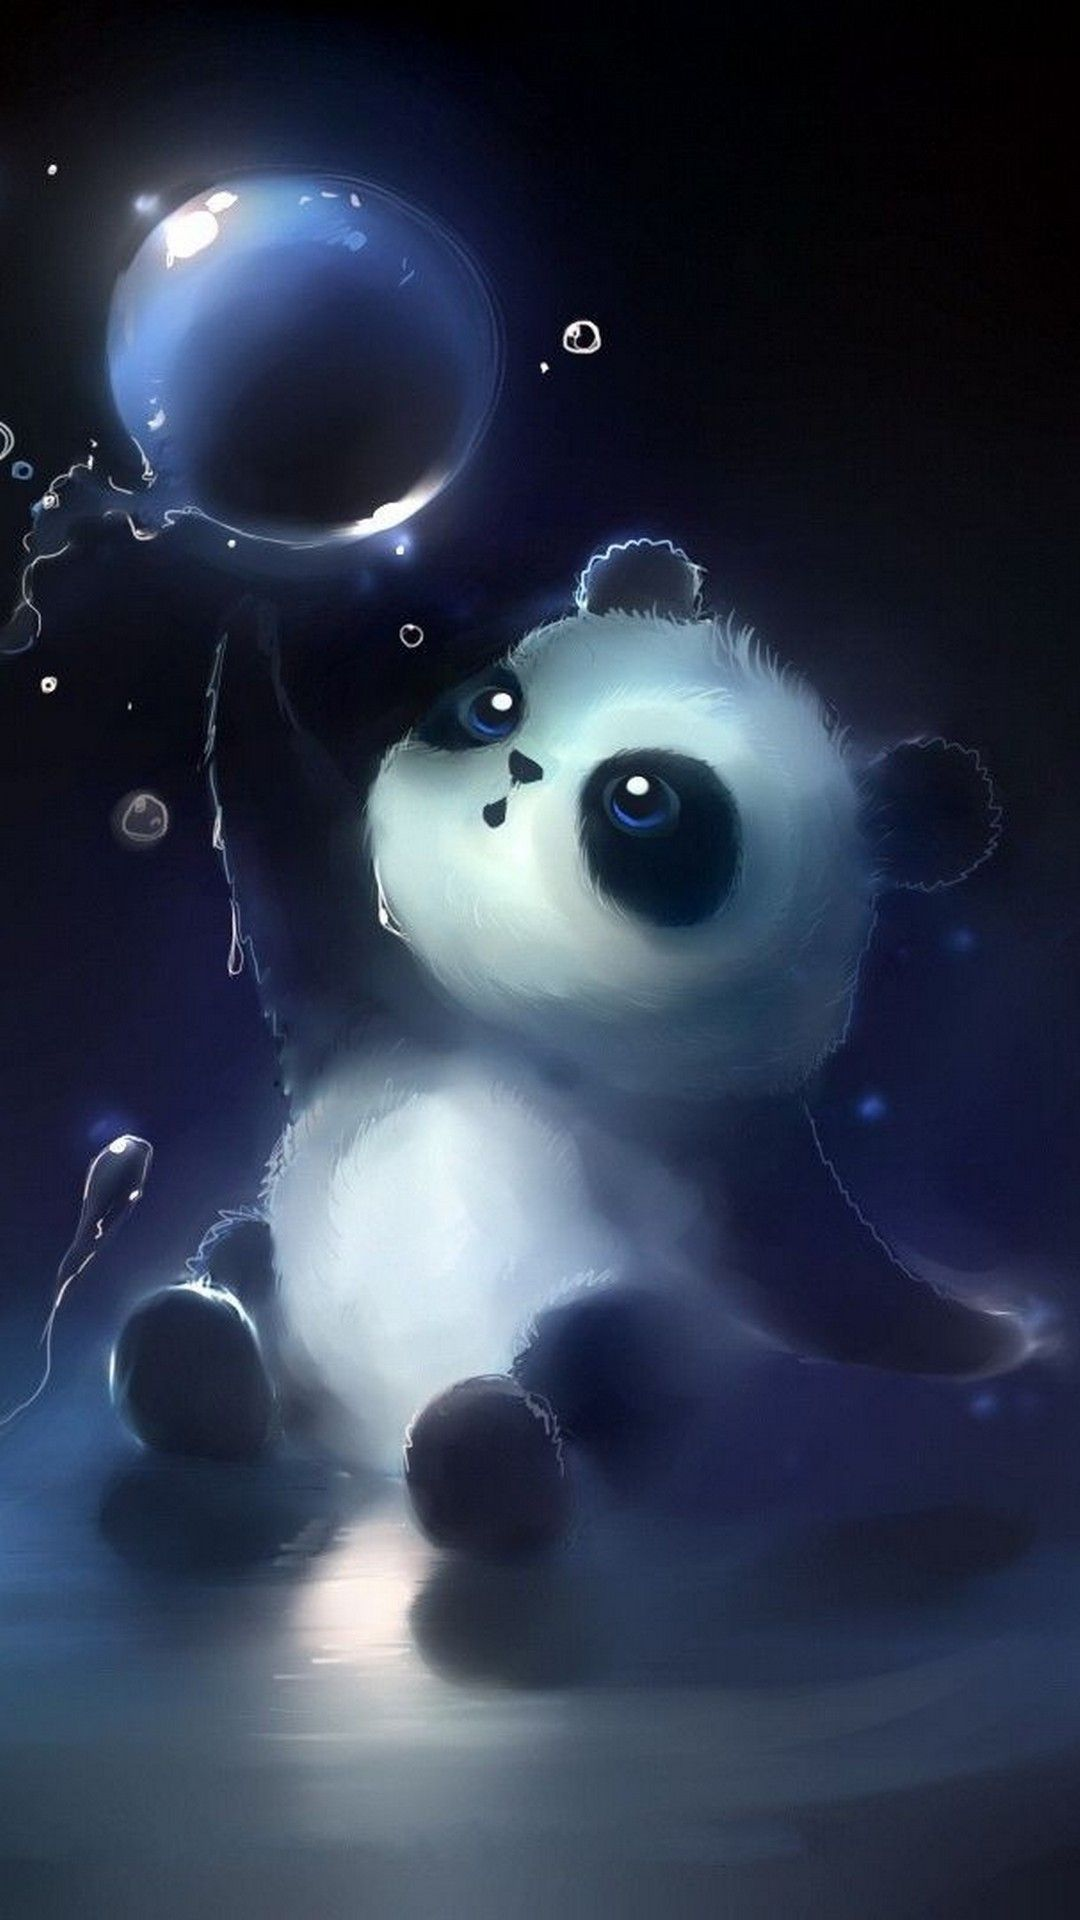 Android Wallpaper Hd Baby Panda Cute Wallpaper Panda Anime